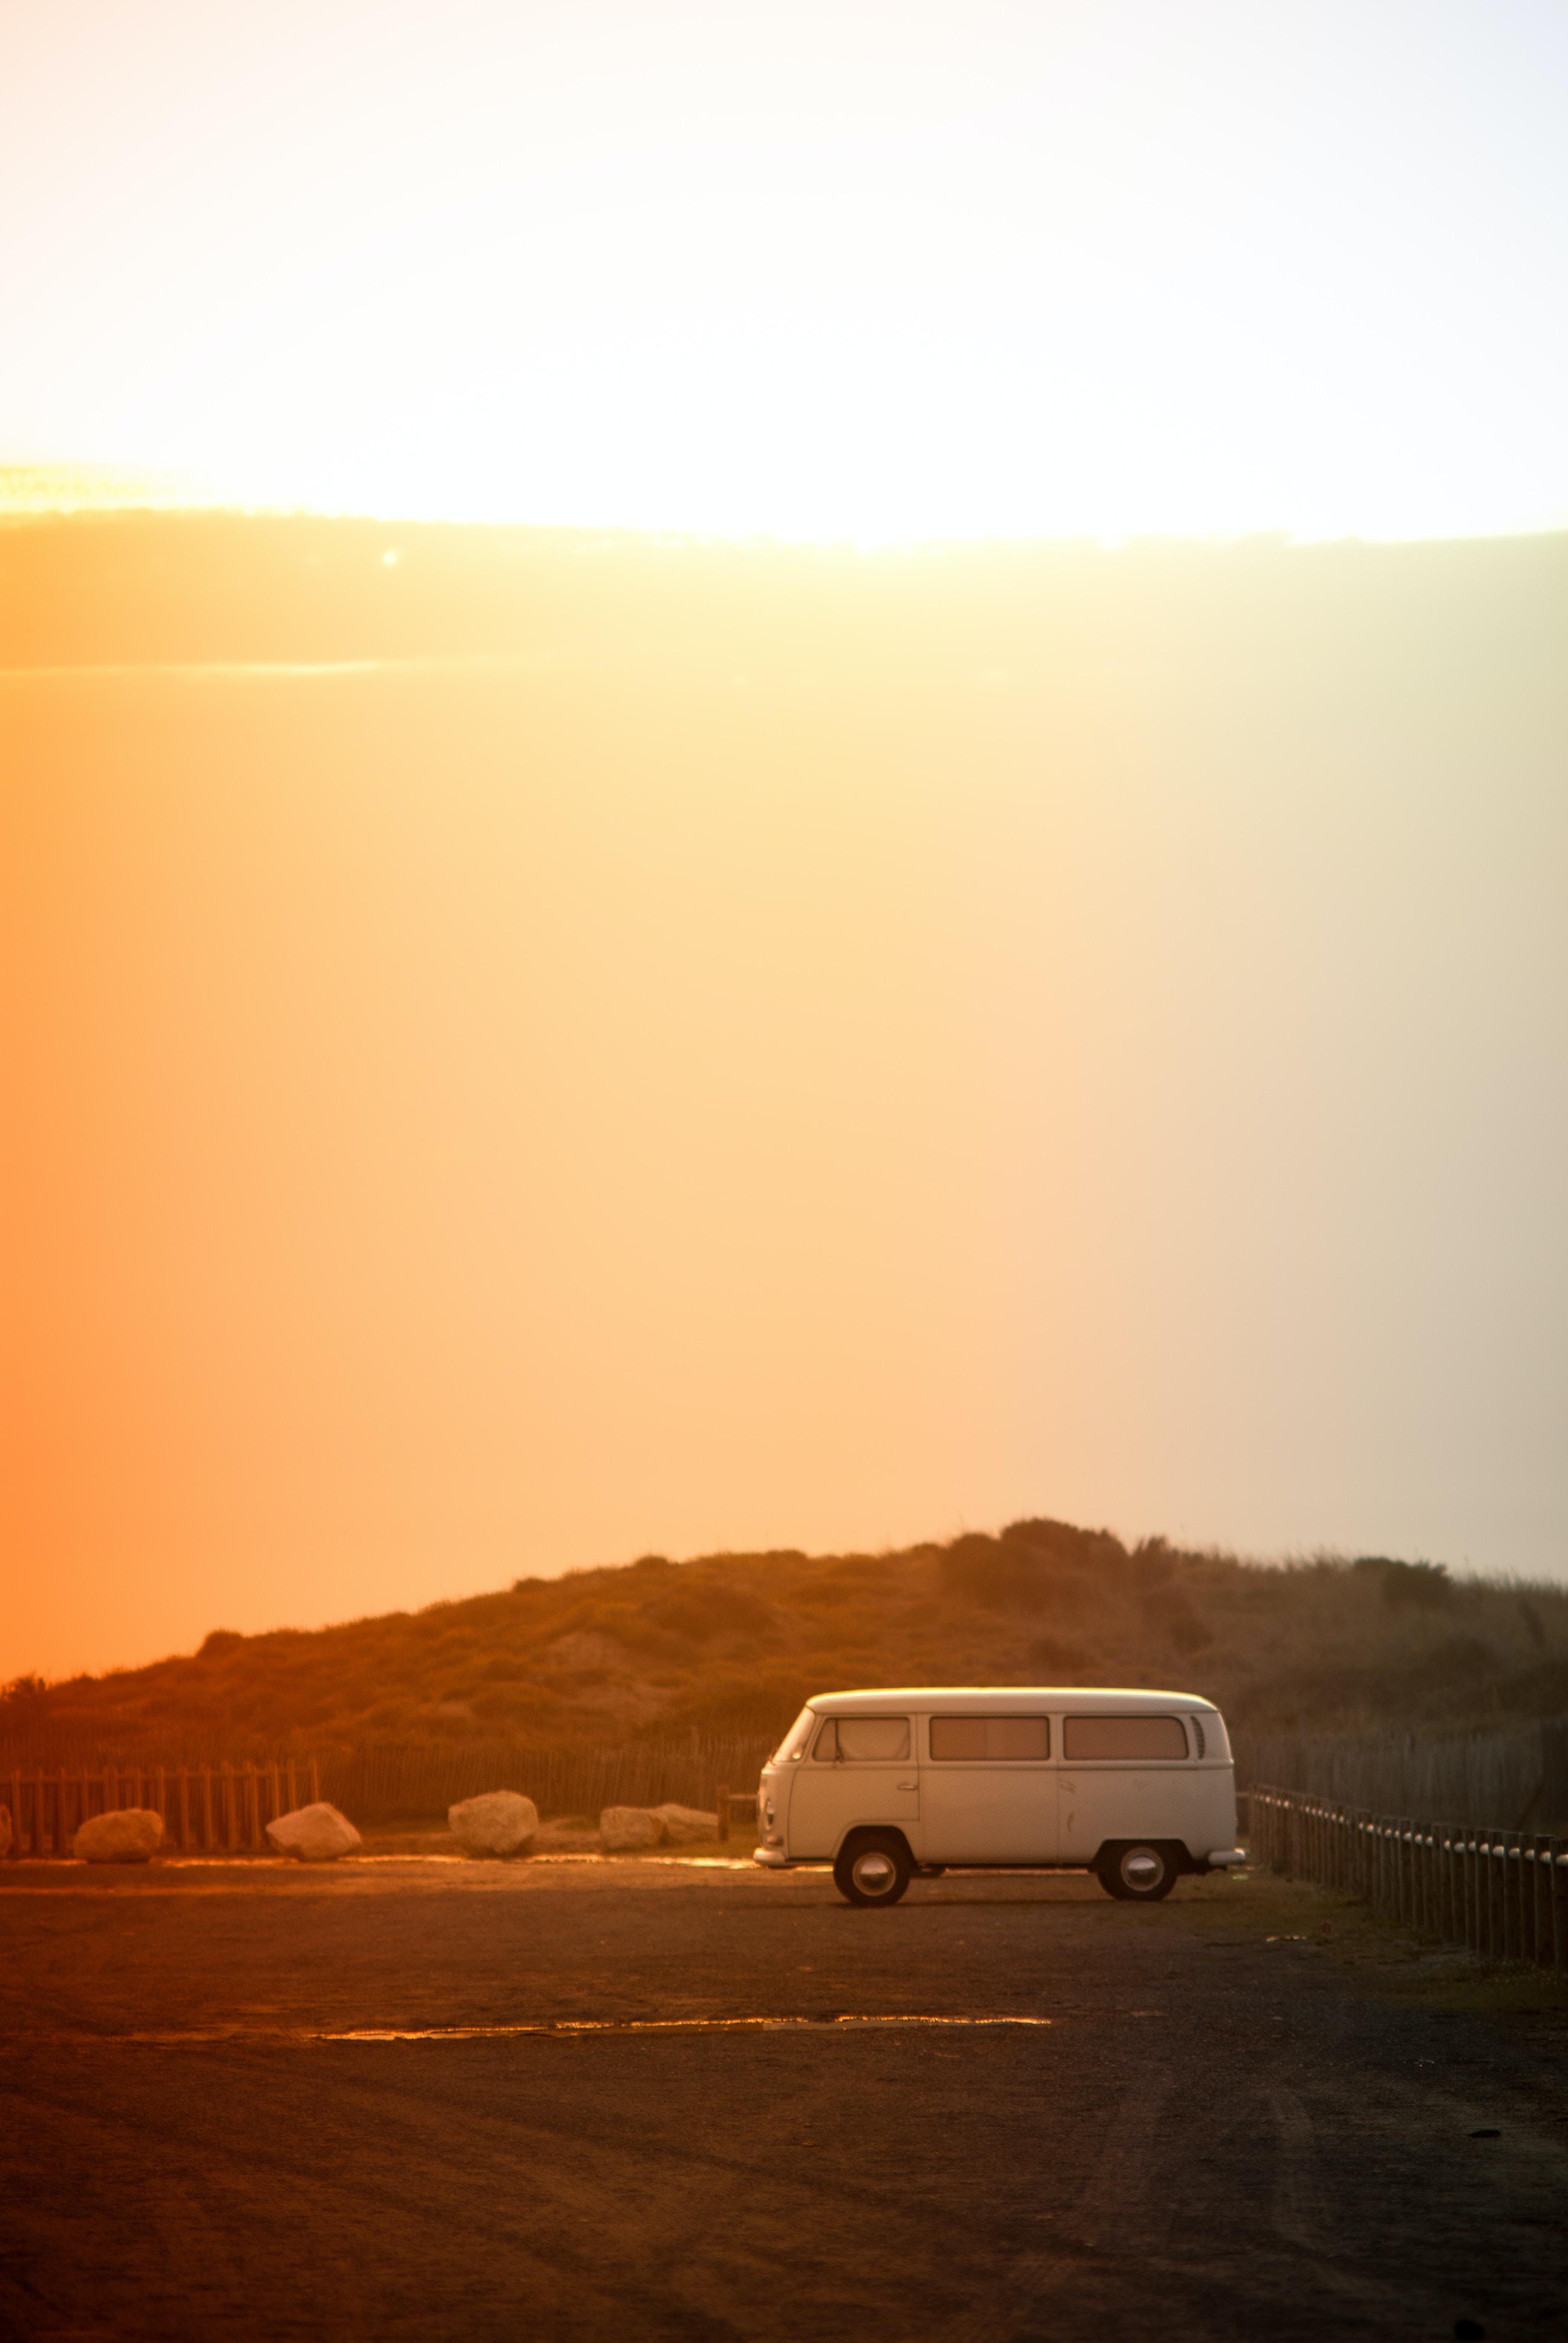 Vintage VW van parked on the side of the desert road